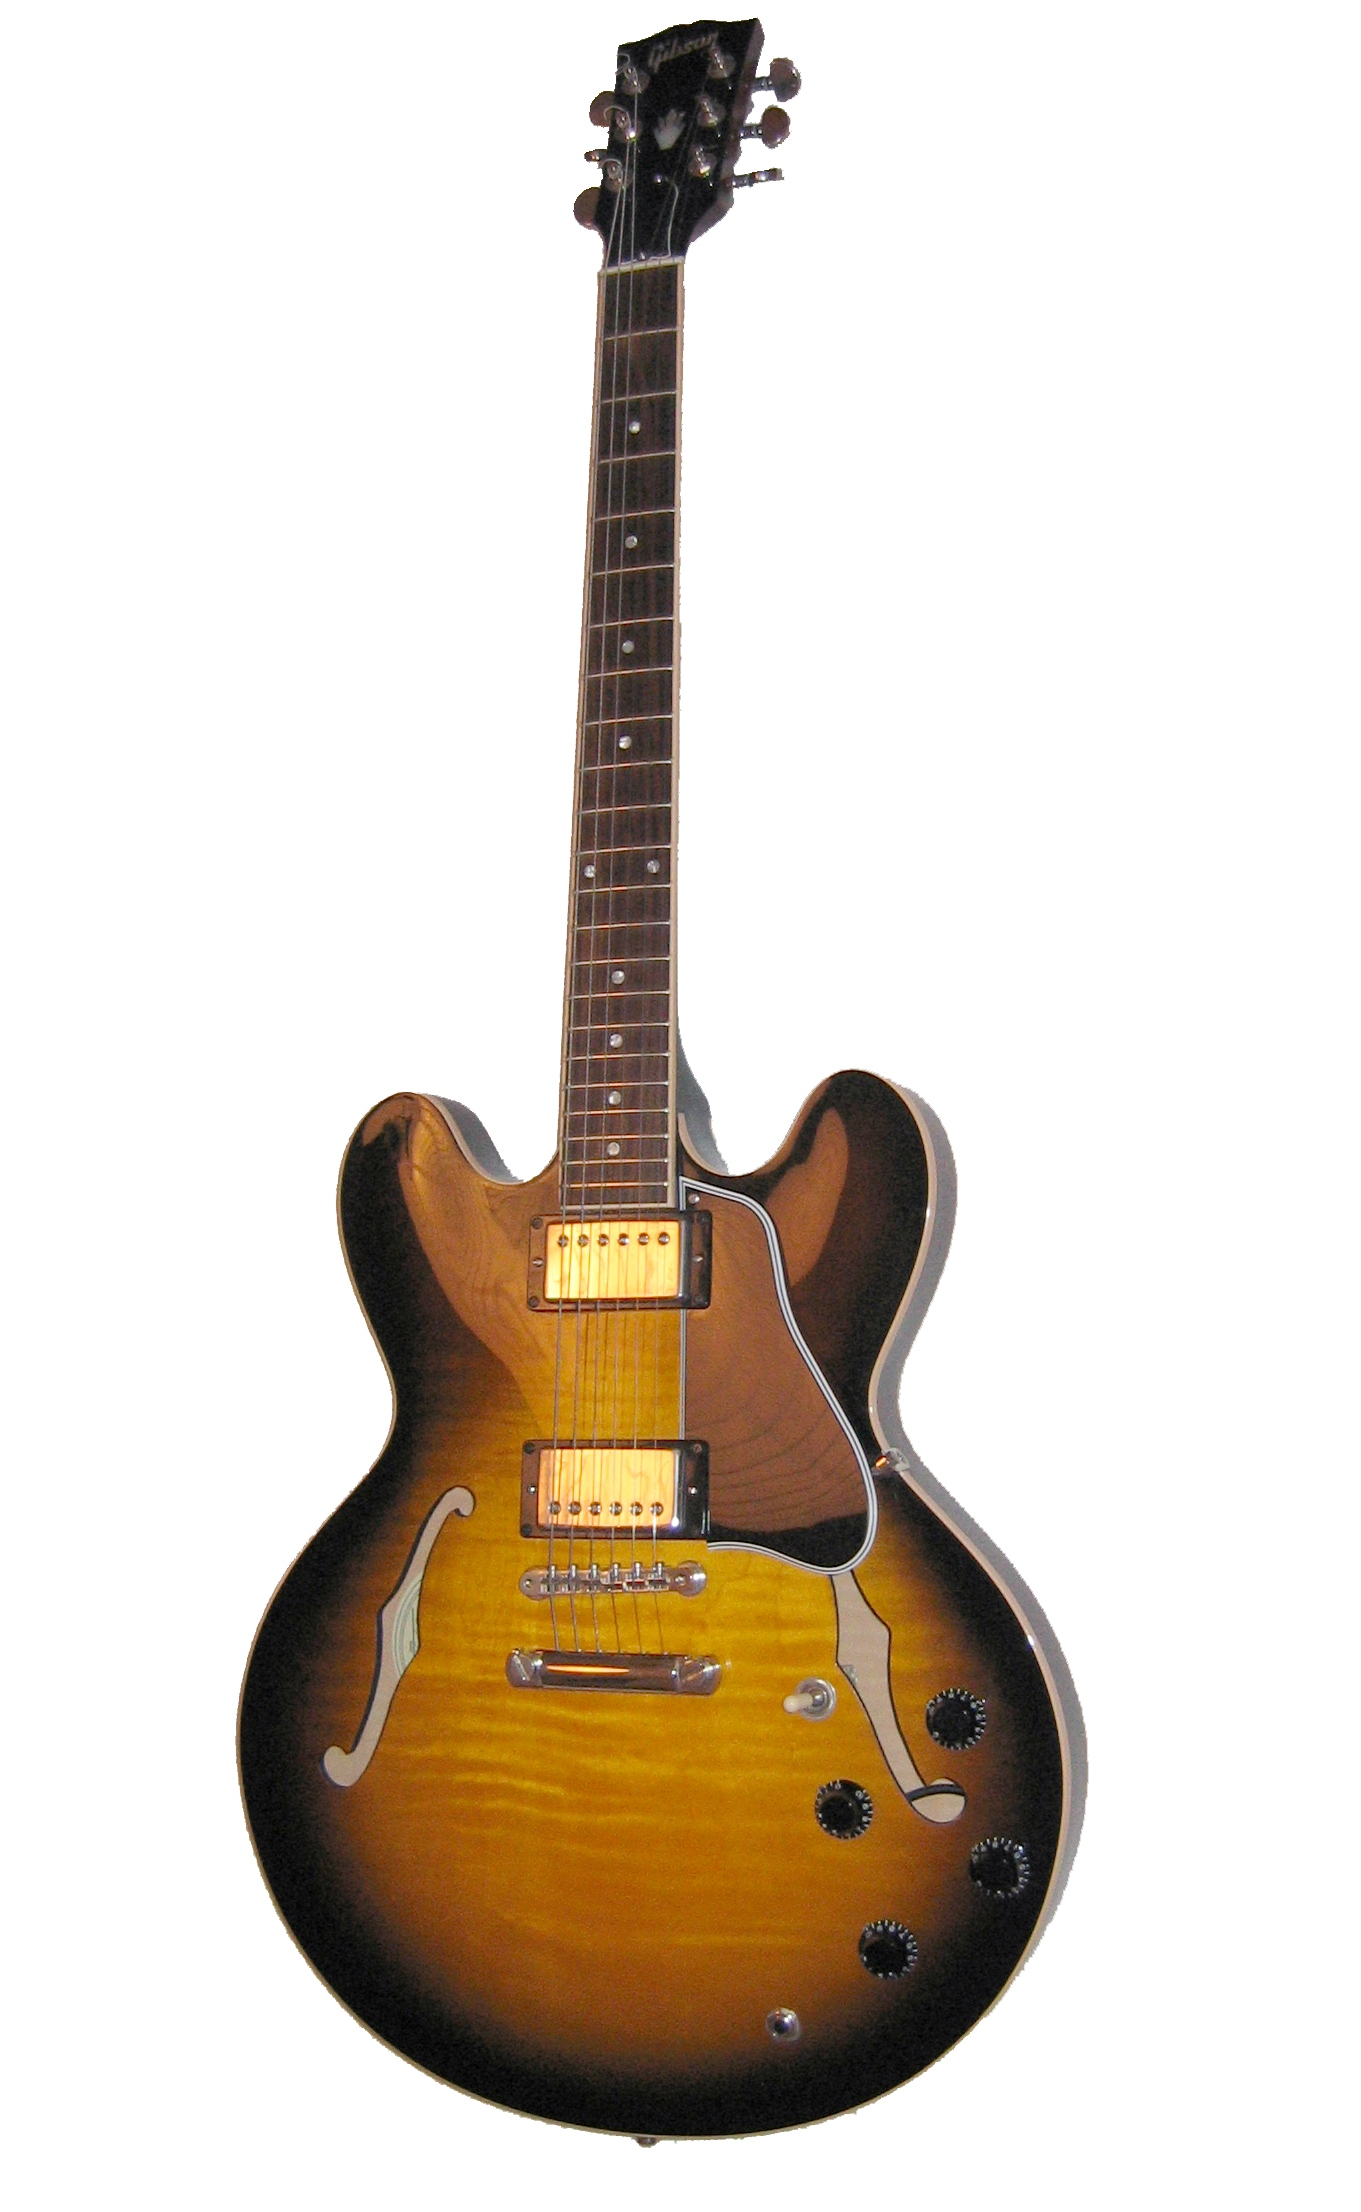 Holow Body Guitars